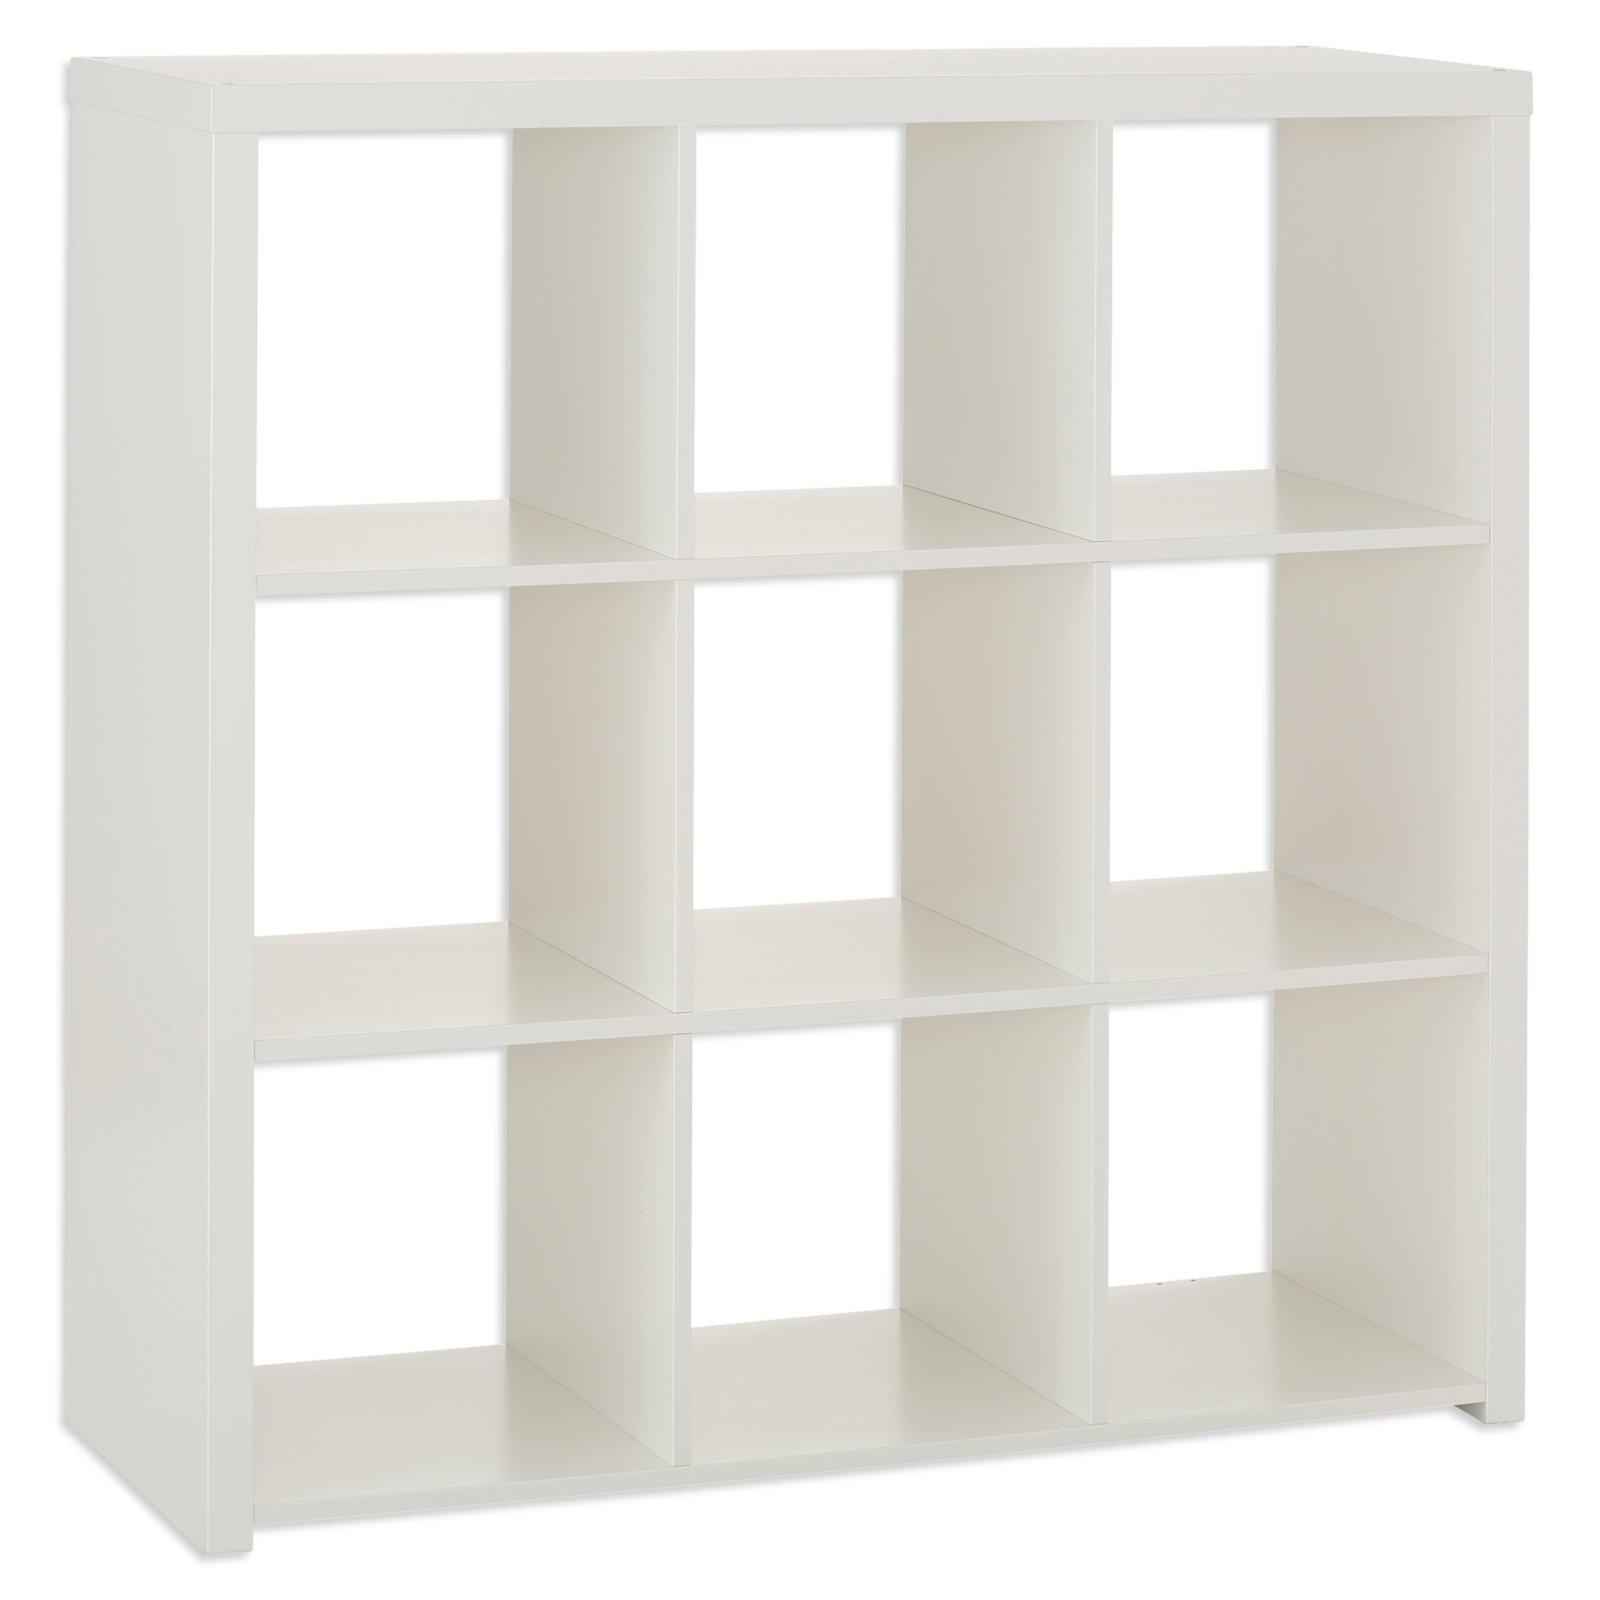 regal marta wei 3x3 f cher regalserie marta regale m bel roller m belhaus. Black Bedroom Furniture Sets. Home Design Ideas